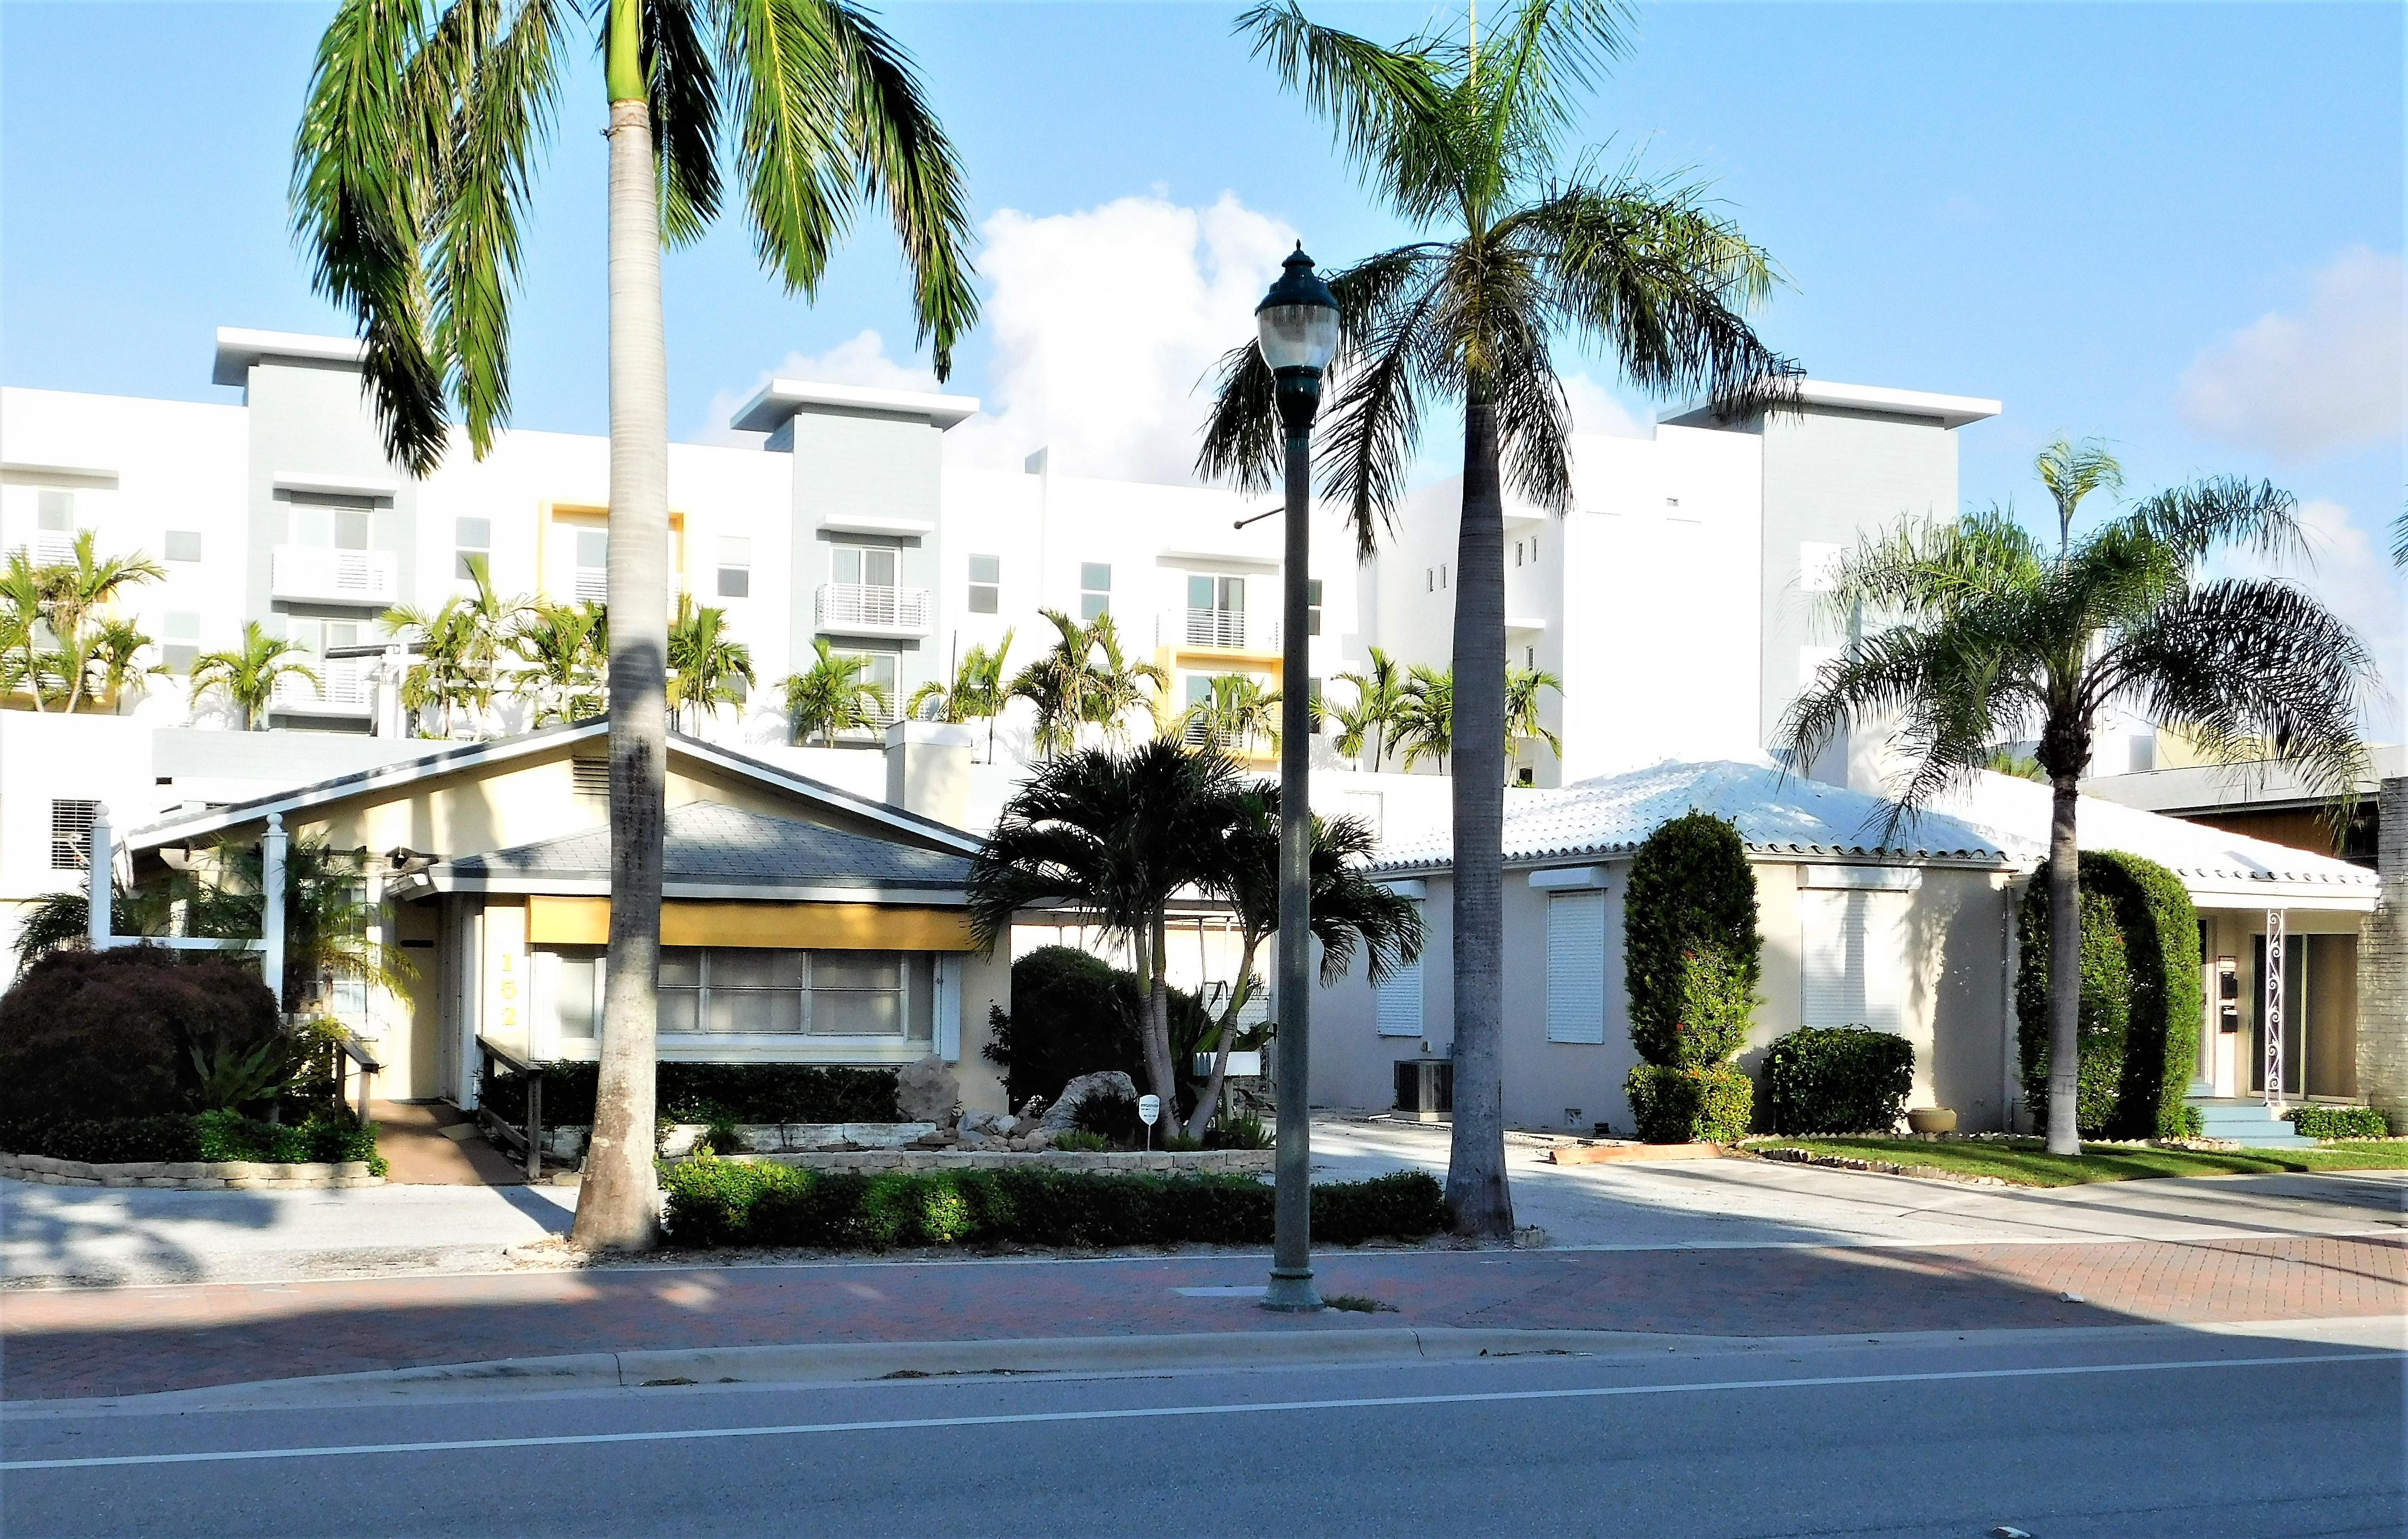 City Of Boynton Beach Fl Property Appraiser